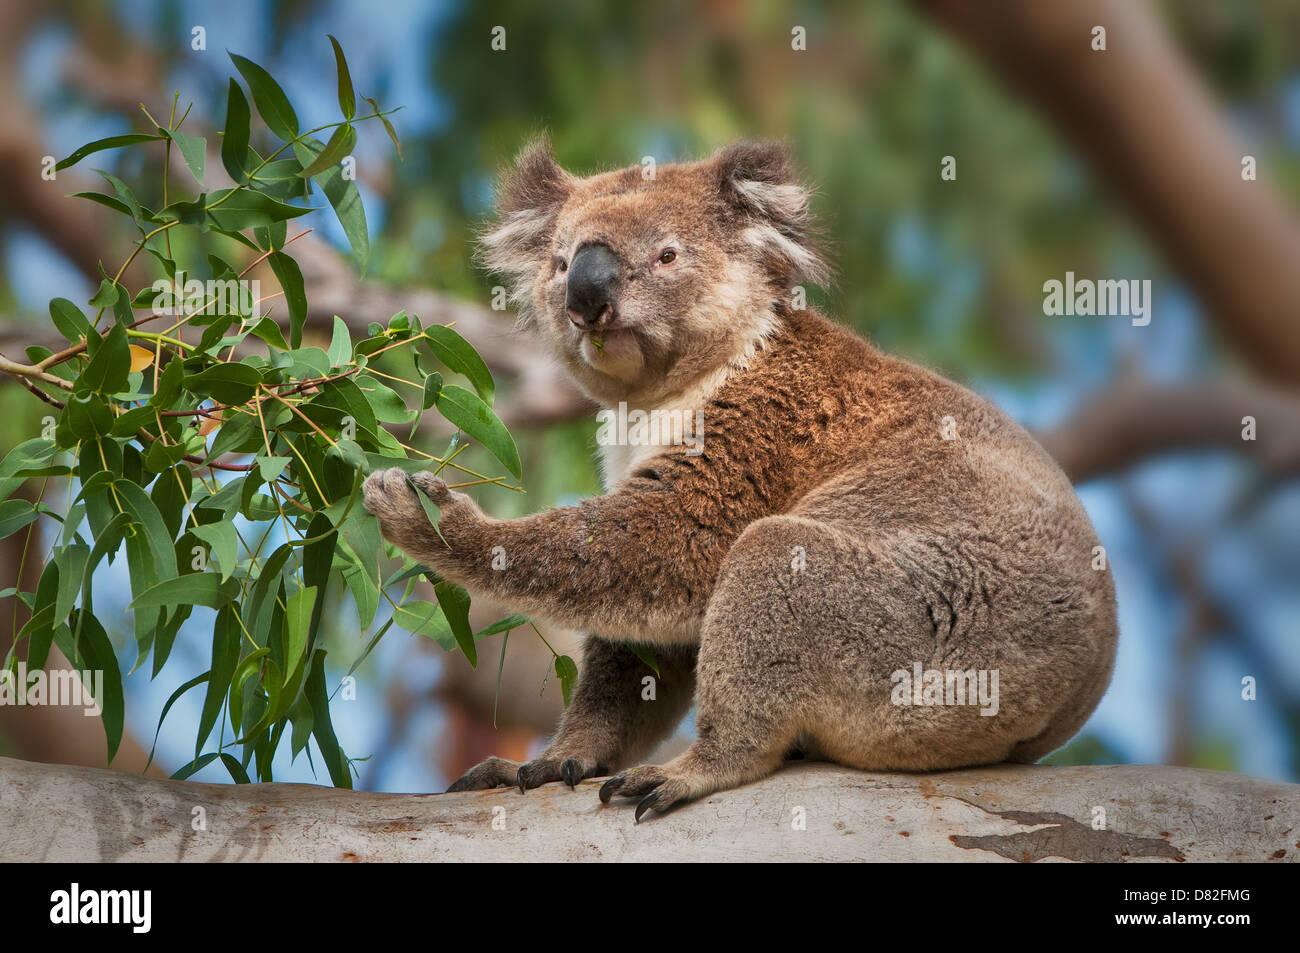 Koala feeding in a eucalyptus tree. - Stock Image